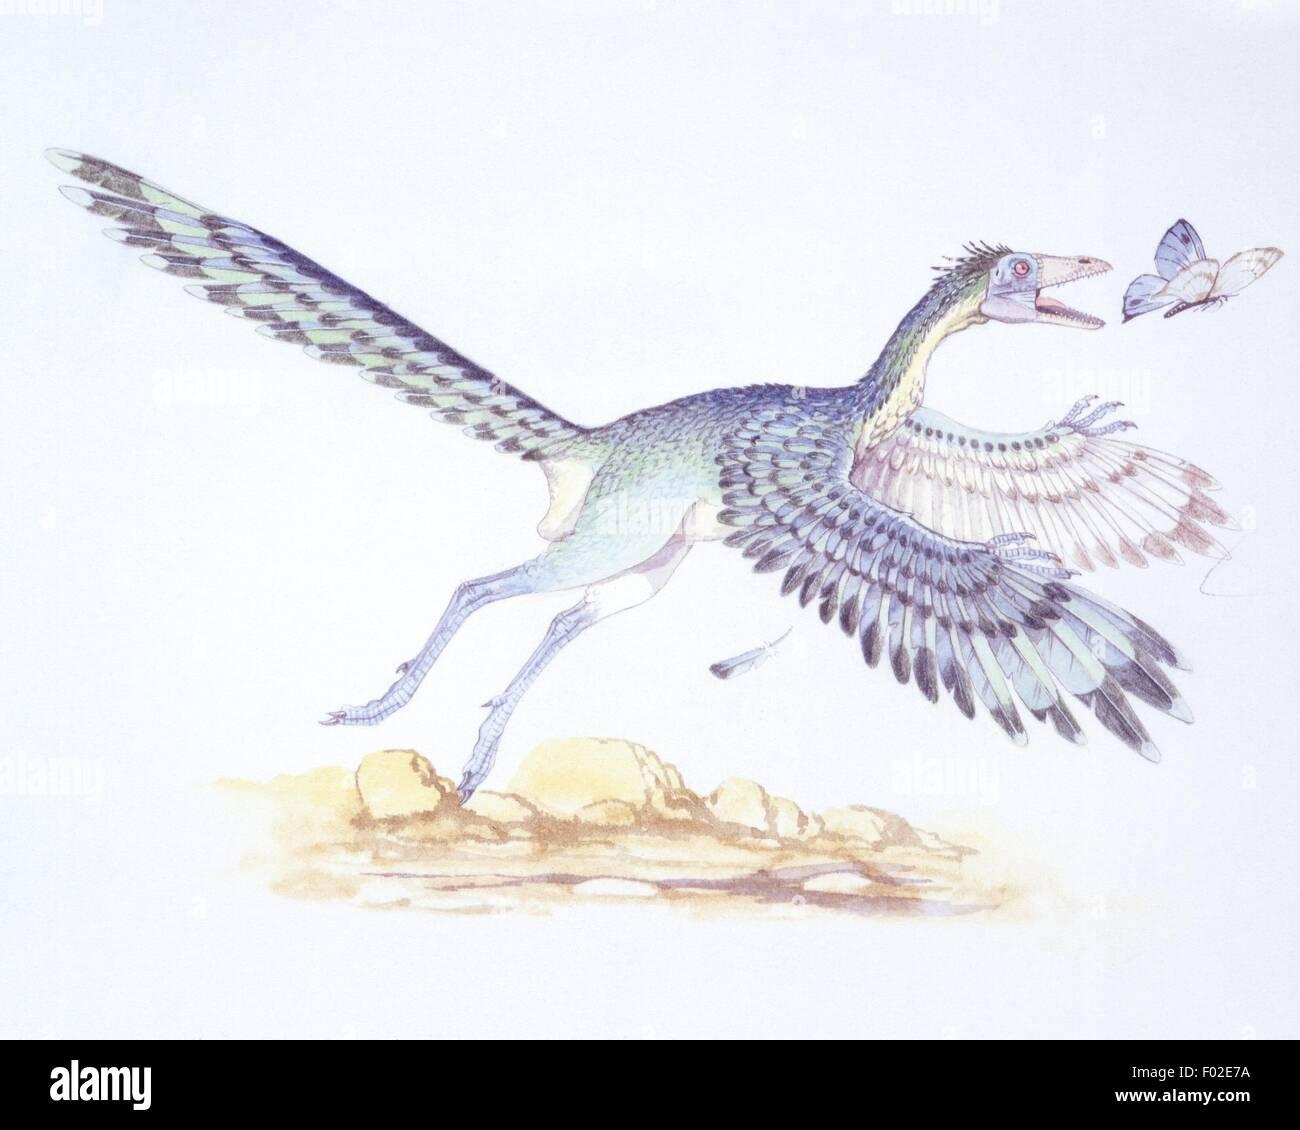 Palaeozoology - Mesozoic period - Fossil birds - Archaeopteryx - Art work - Stock Image